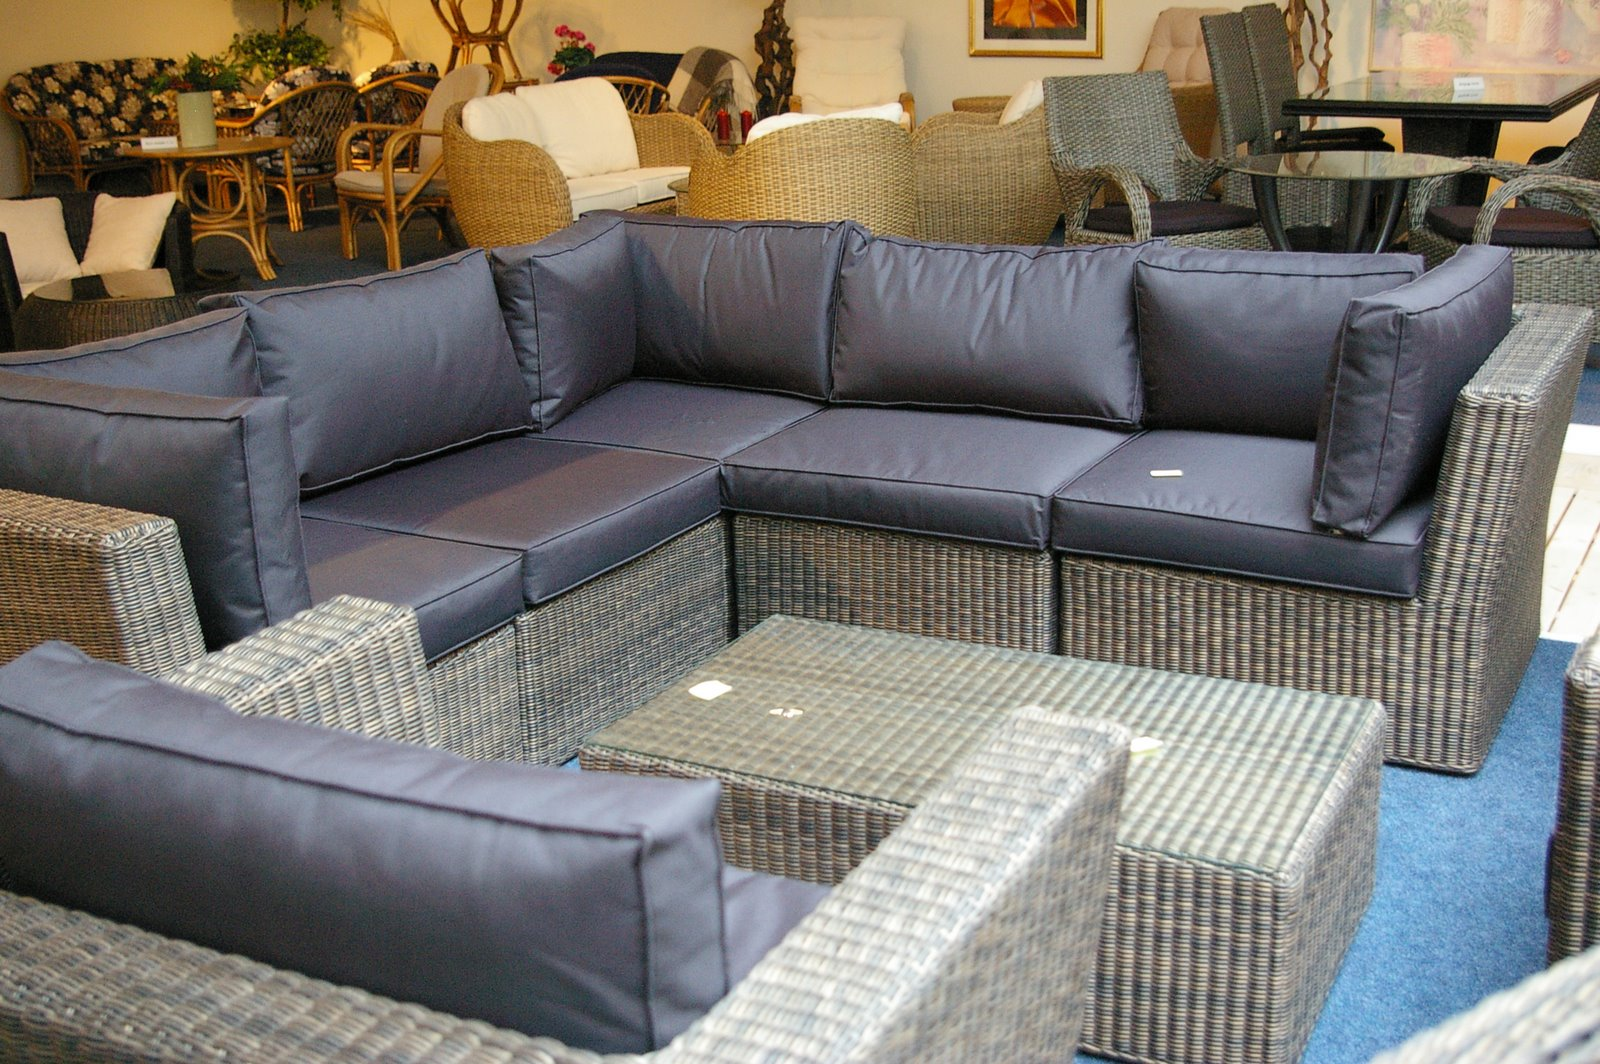 lounge utemöbler - Uncategorized En blogg om design Utemöbler trädgårdsmöbler Sida 9